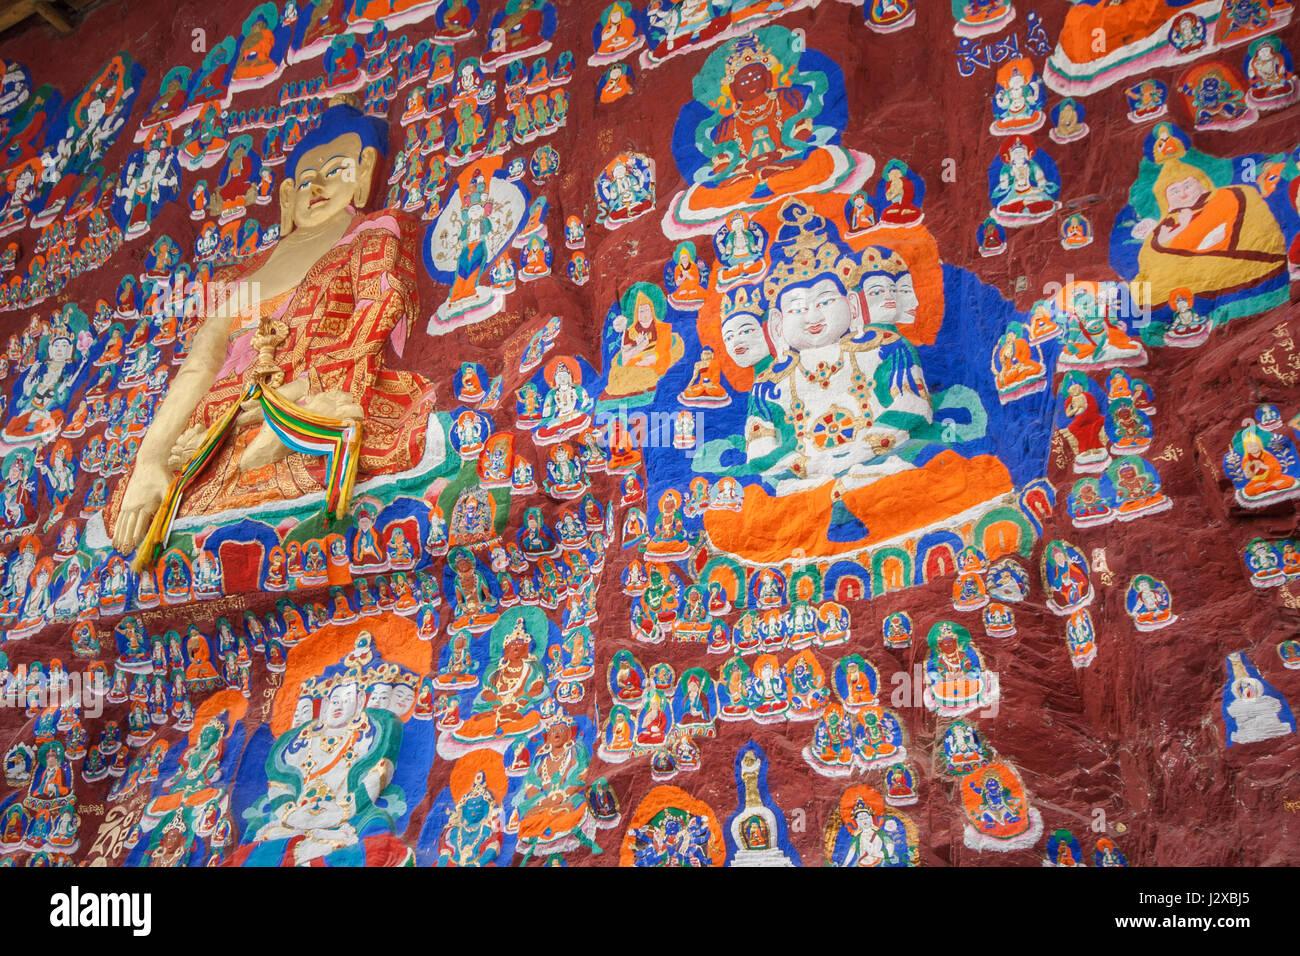 Thousand Buddha cliffside sculpture in Lhasa, Tibet. - Stock Image